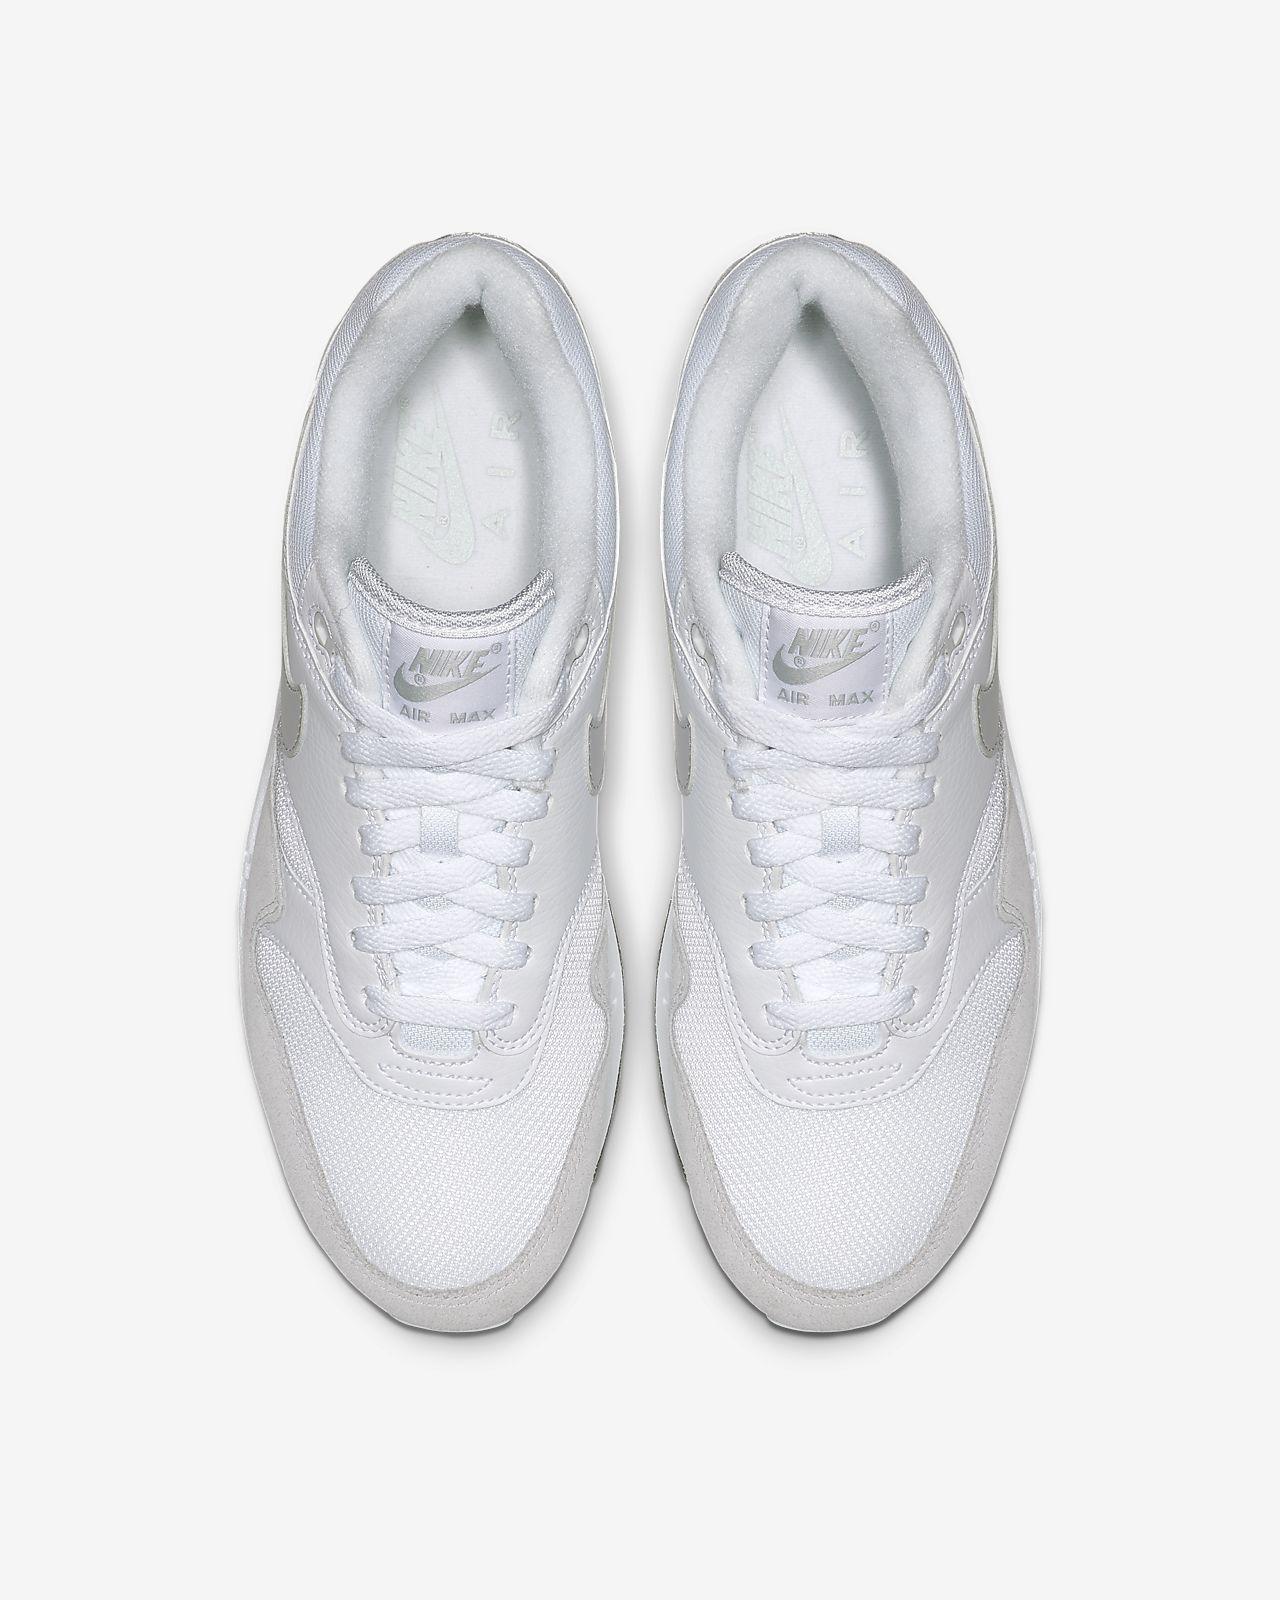 hot sales c23d9 dee5e ... Chaussure Nike Air Max 1 pour Homme